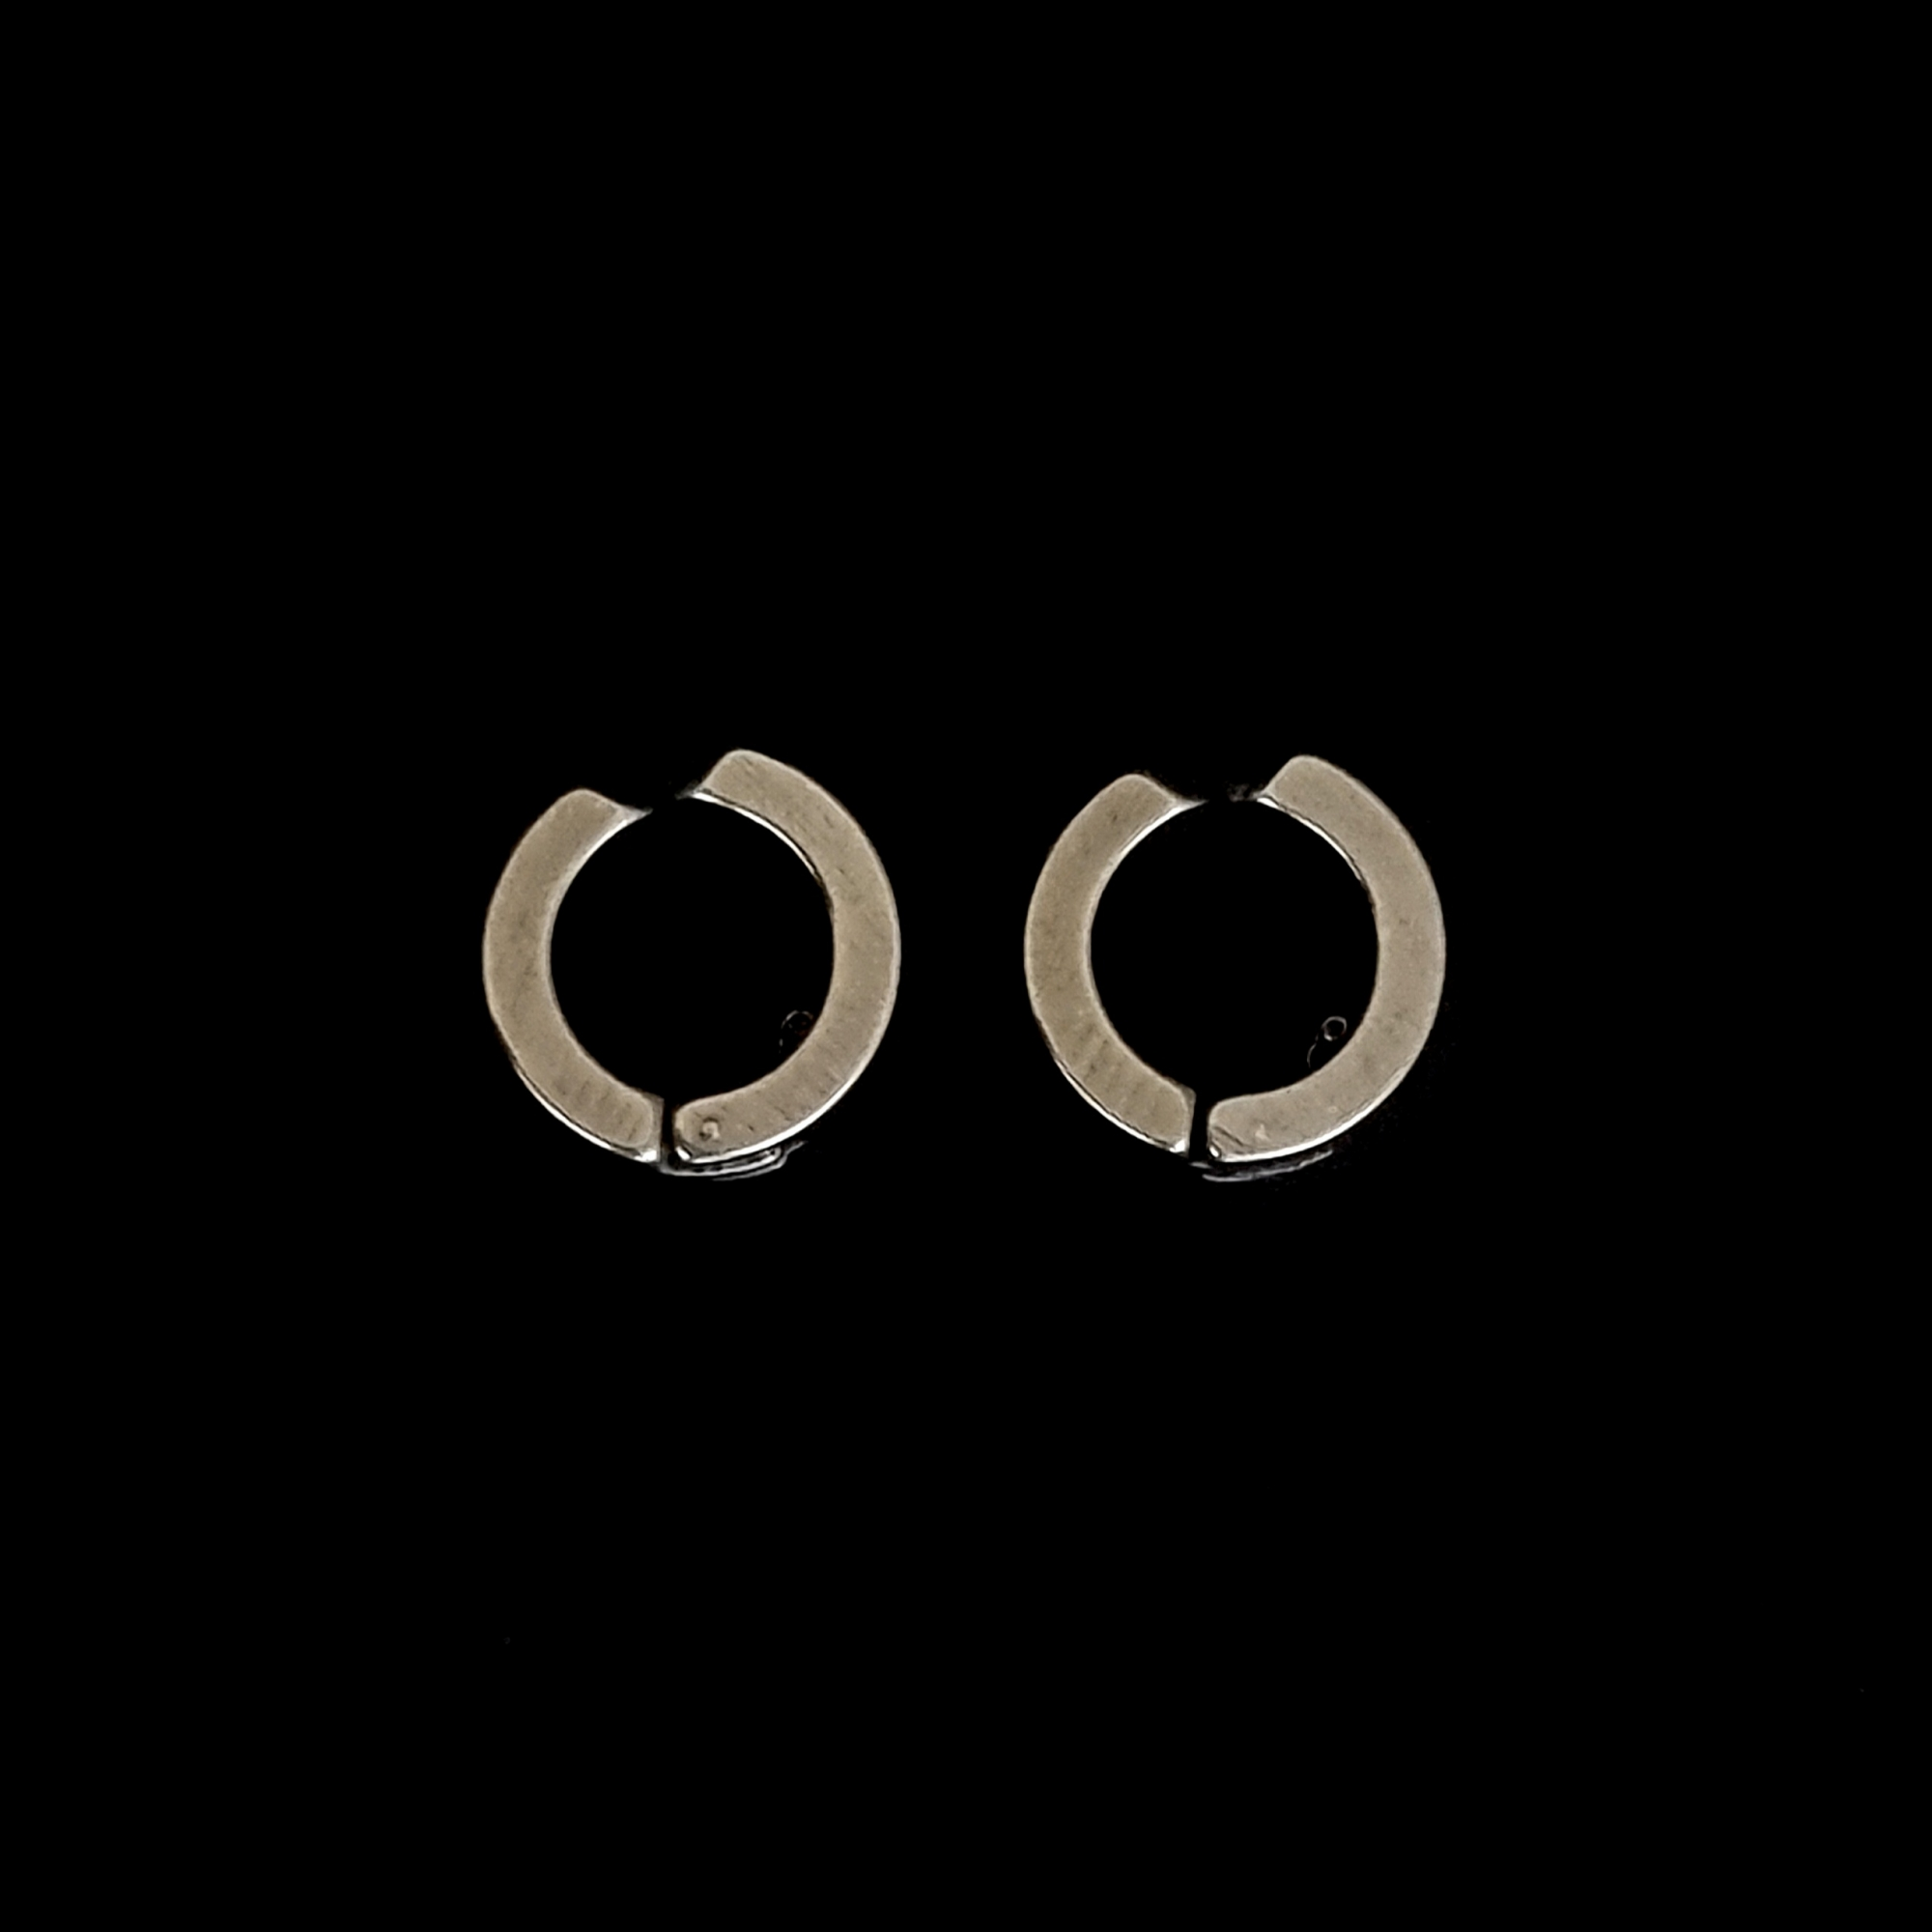 Brinco Masculino Aço Inox Ring One Prata